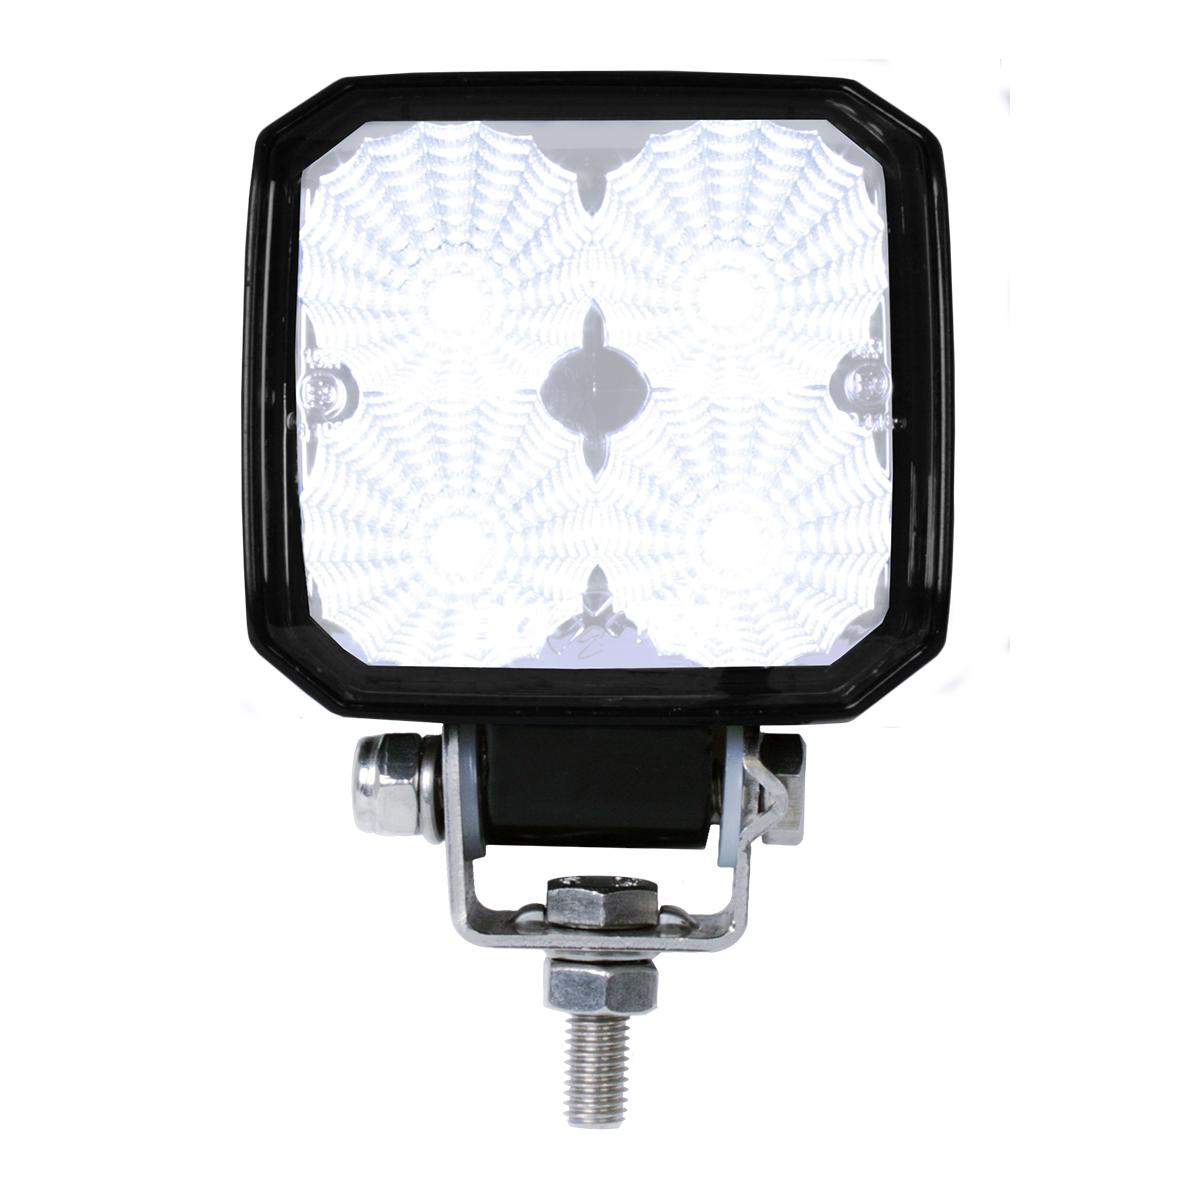 76363 Small High Power LED Work Light